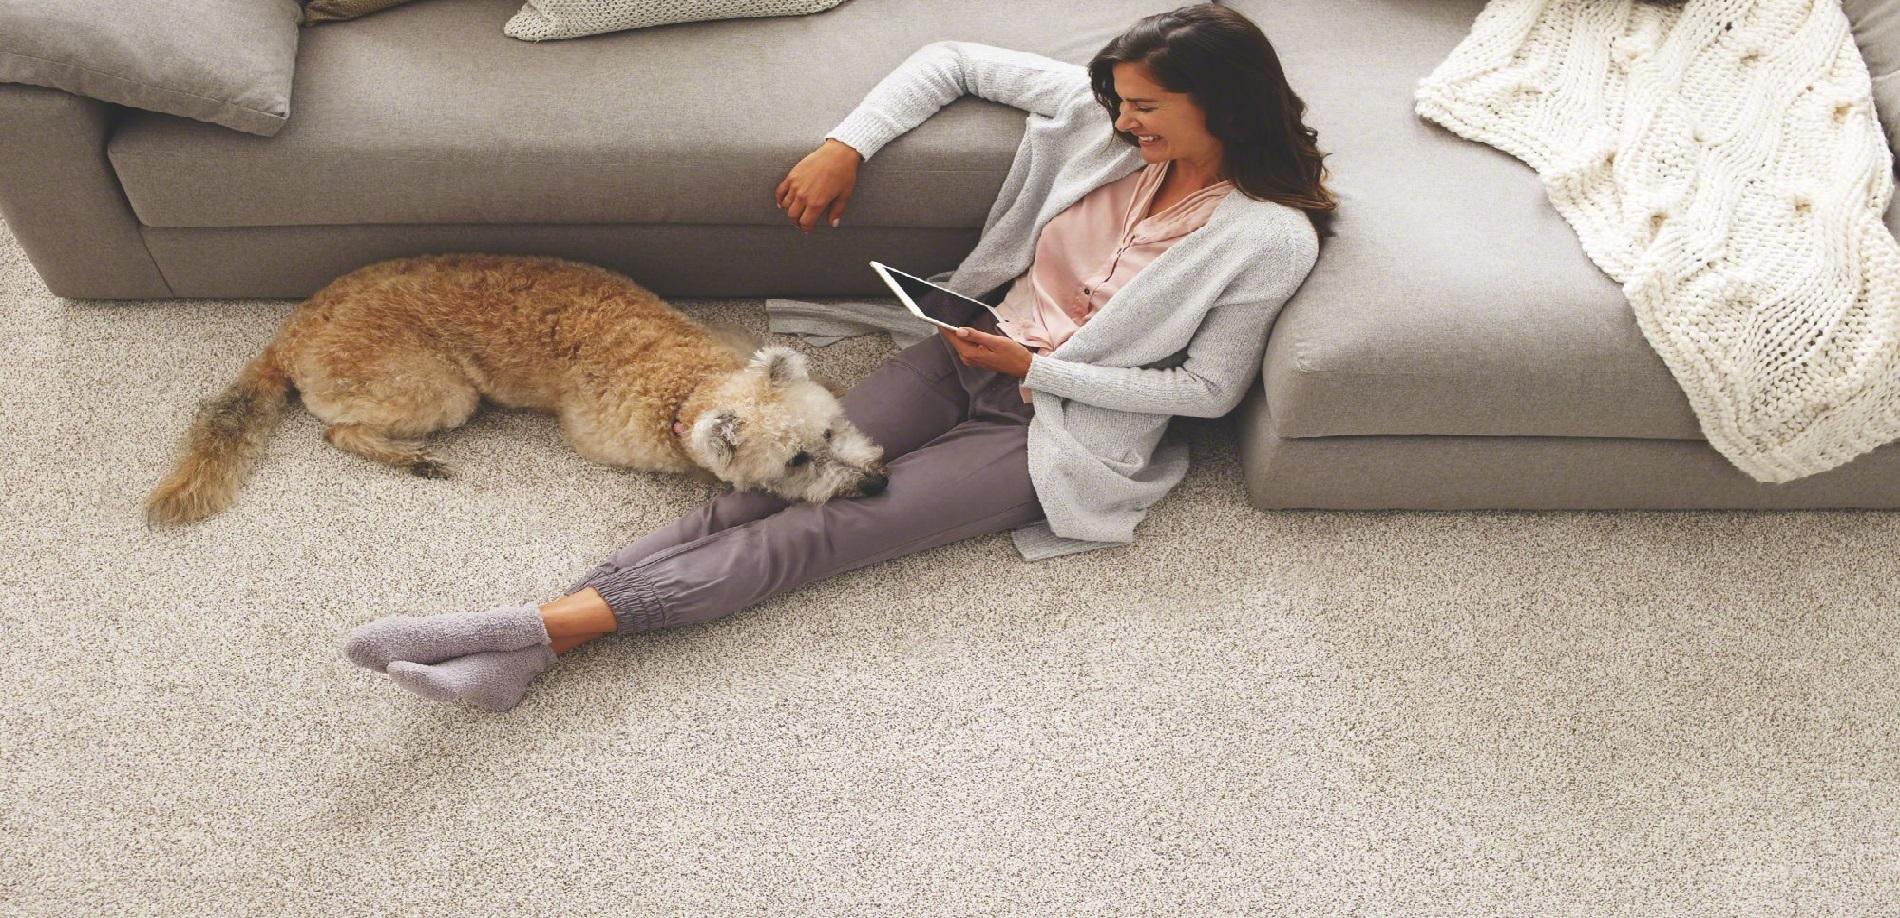 carpet-picture-47601.jpg